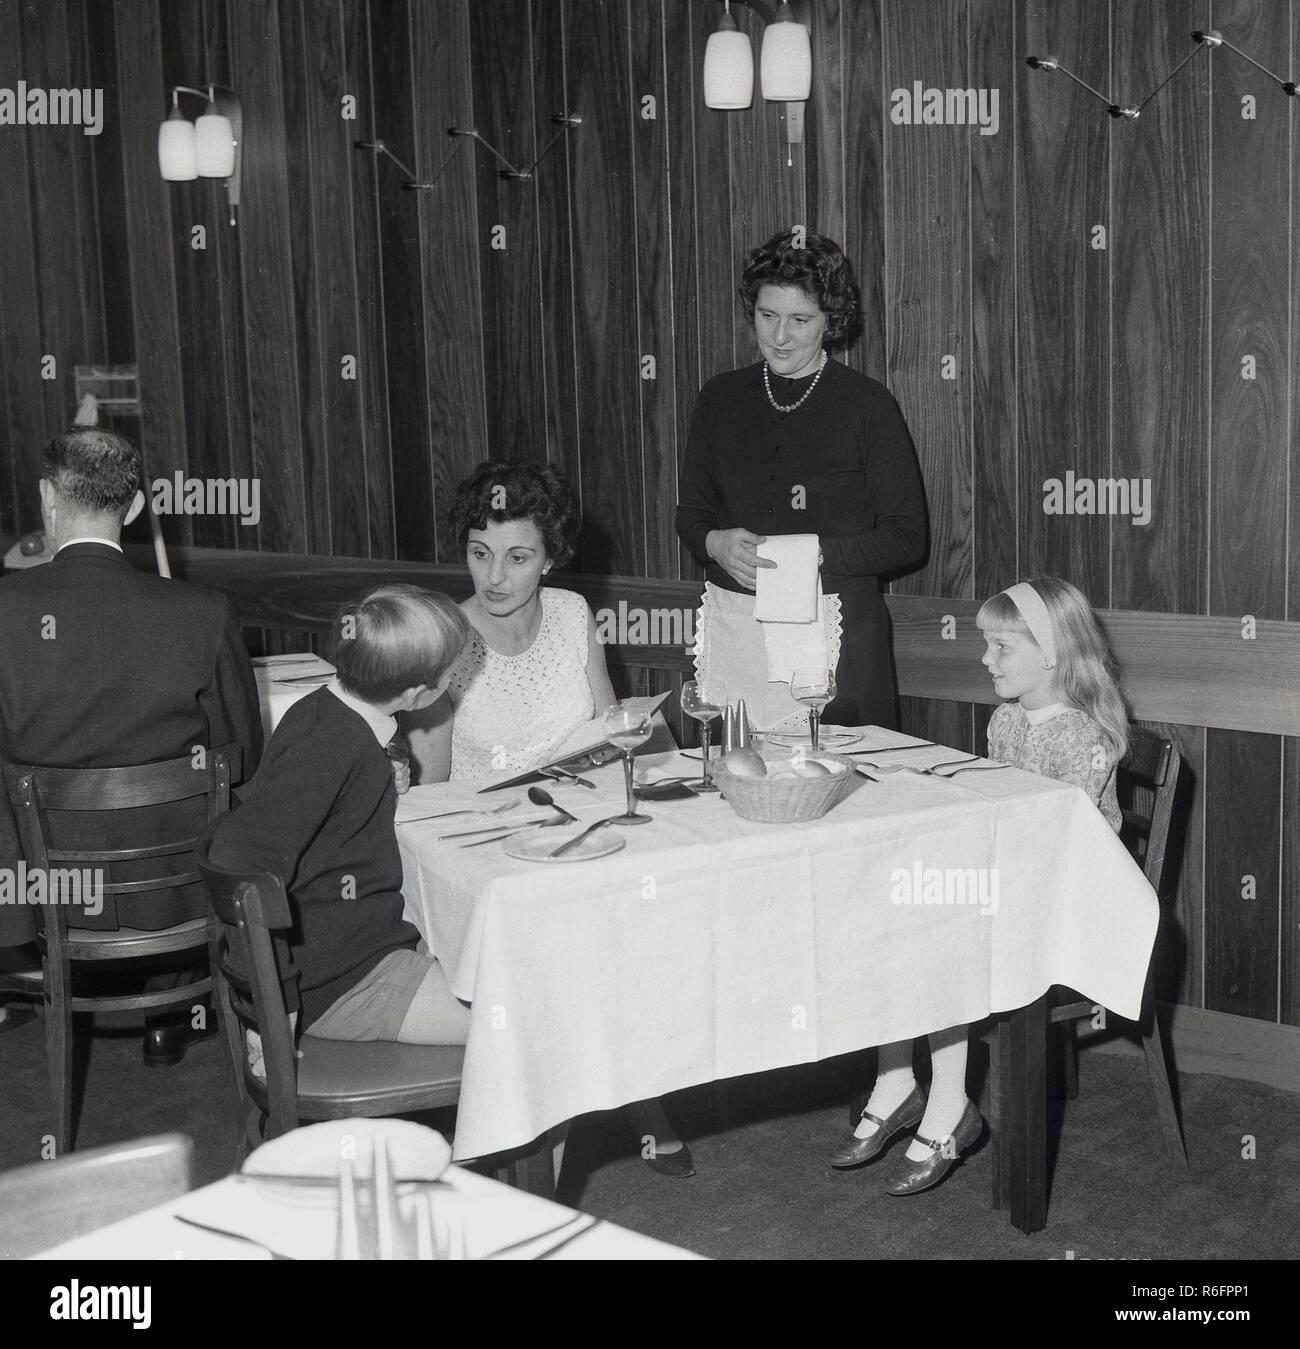 1960s Waitress Stock Photos Amp 1960s Waitress Stock Images